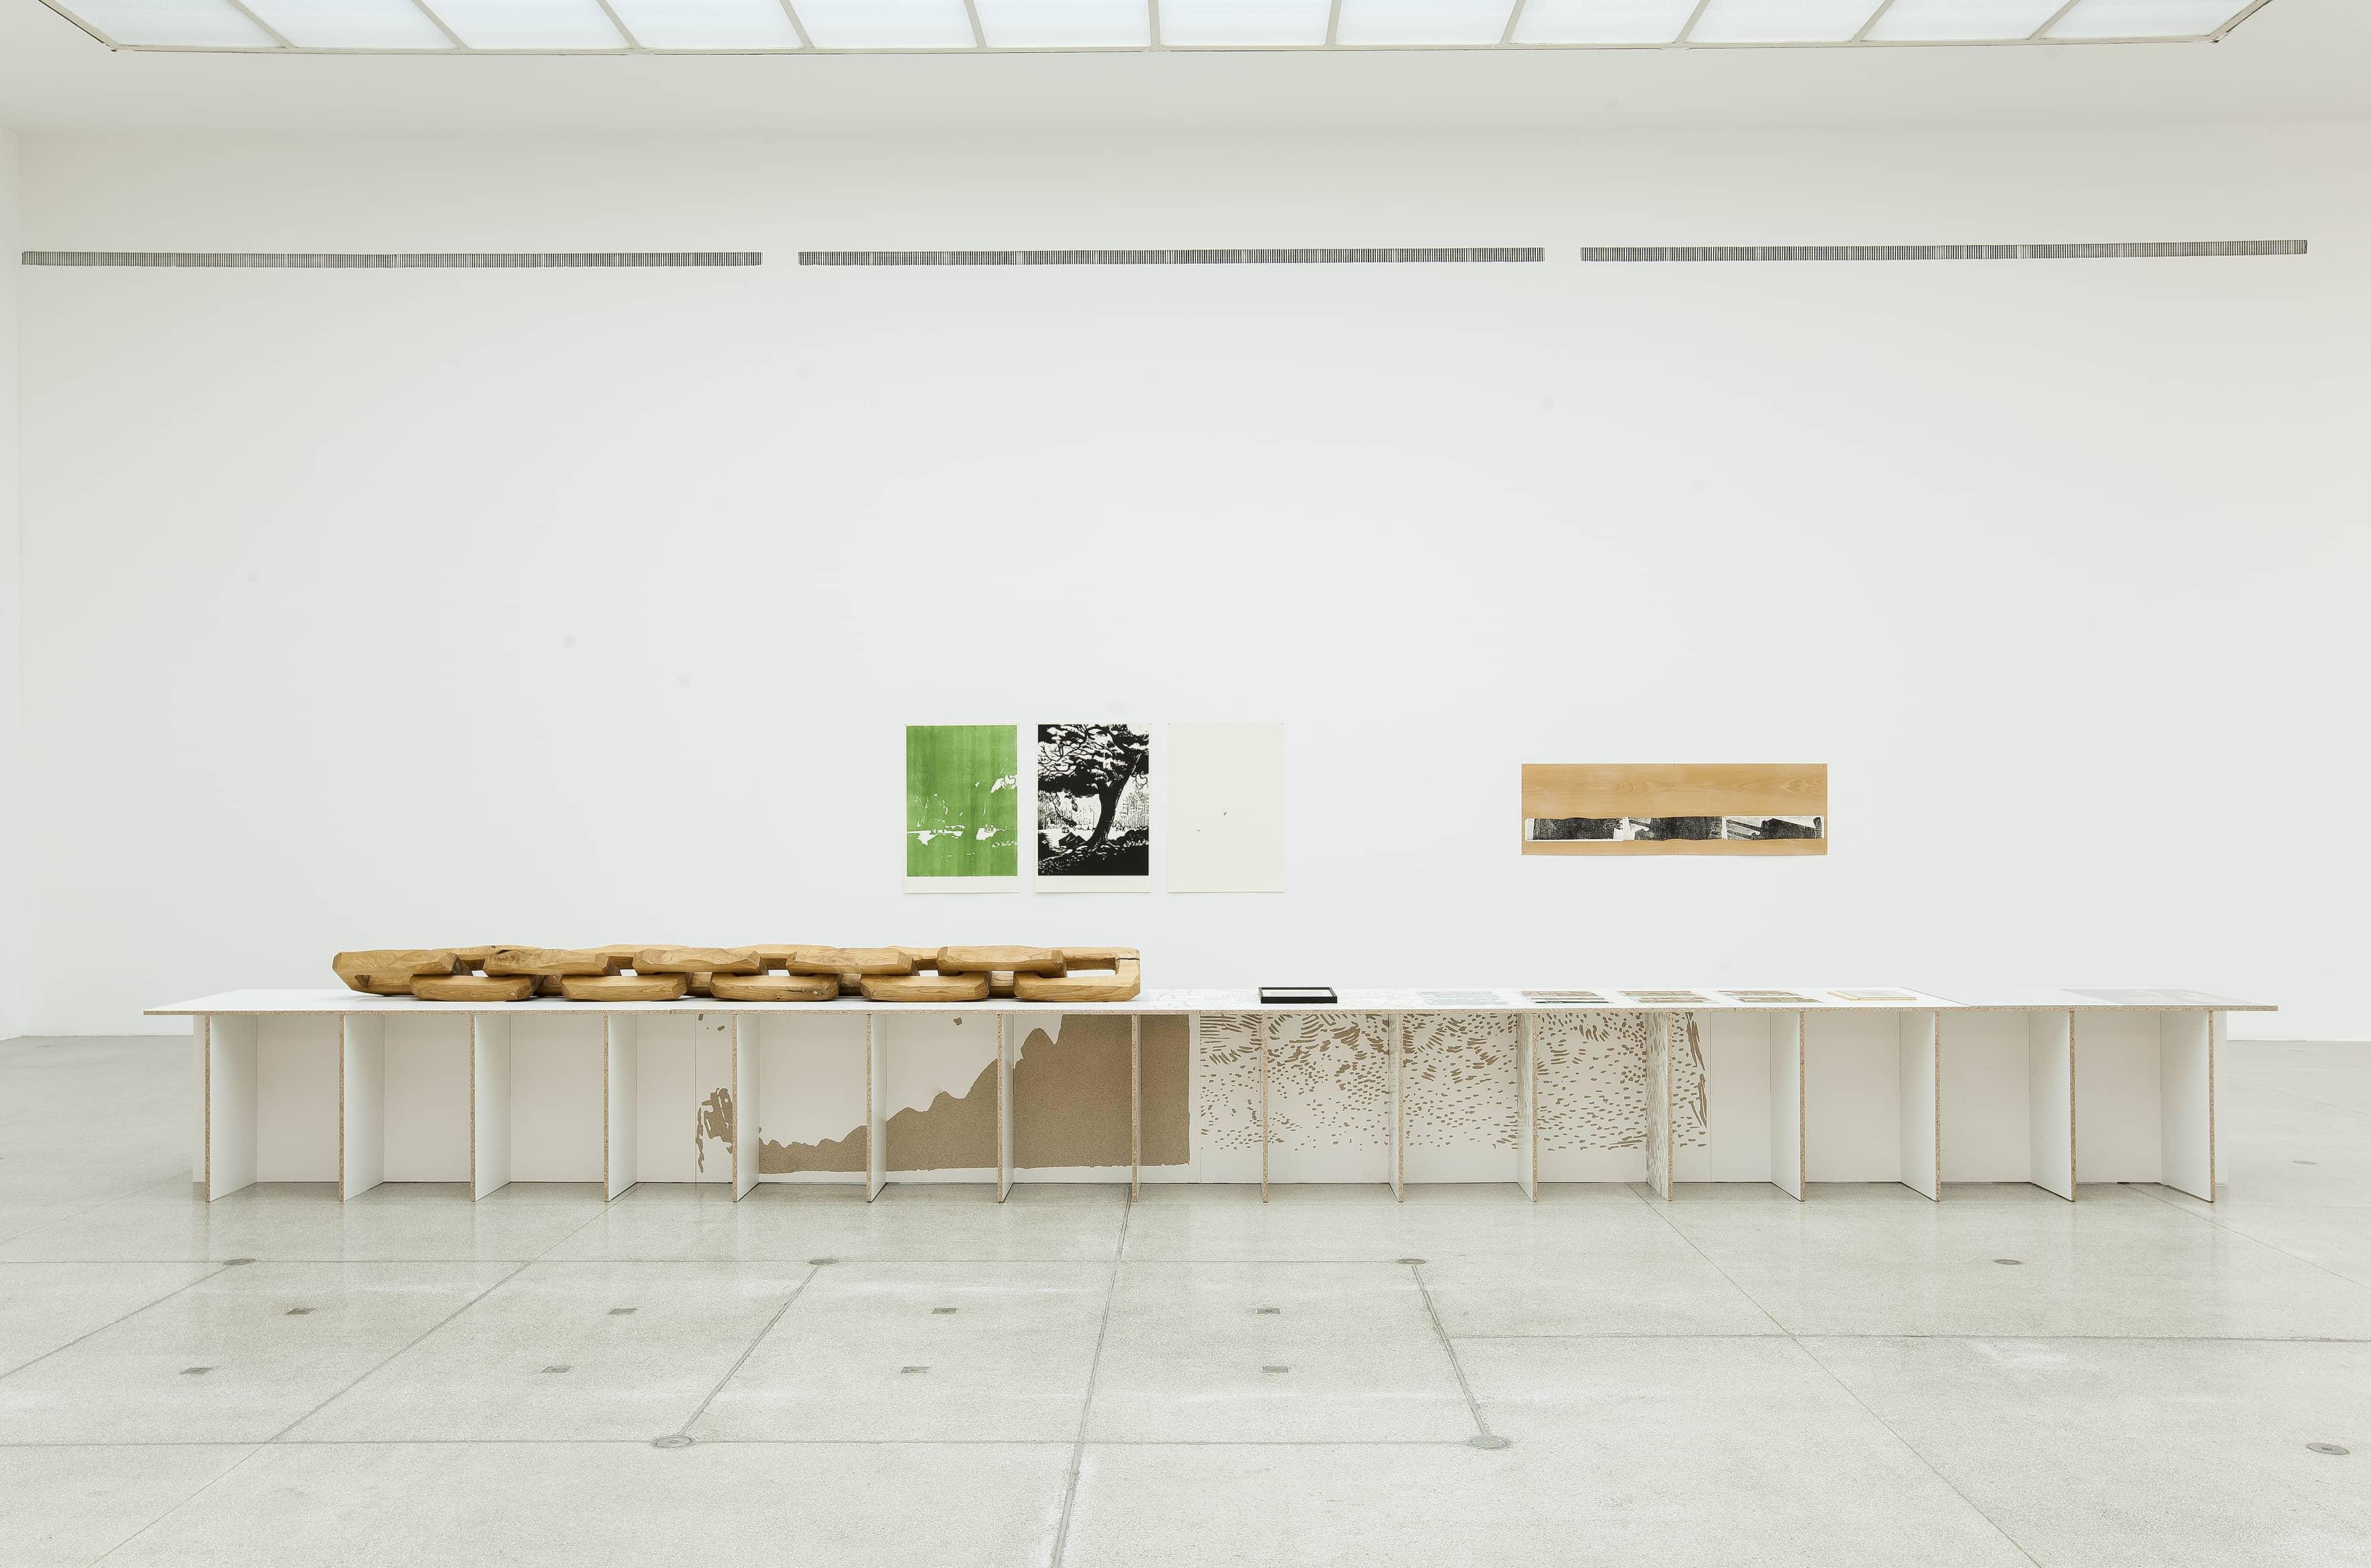 Installation view: A Singular Form, 2016. Secession, Vienna |  | ProjecteSD